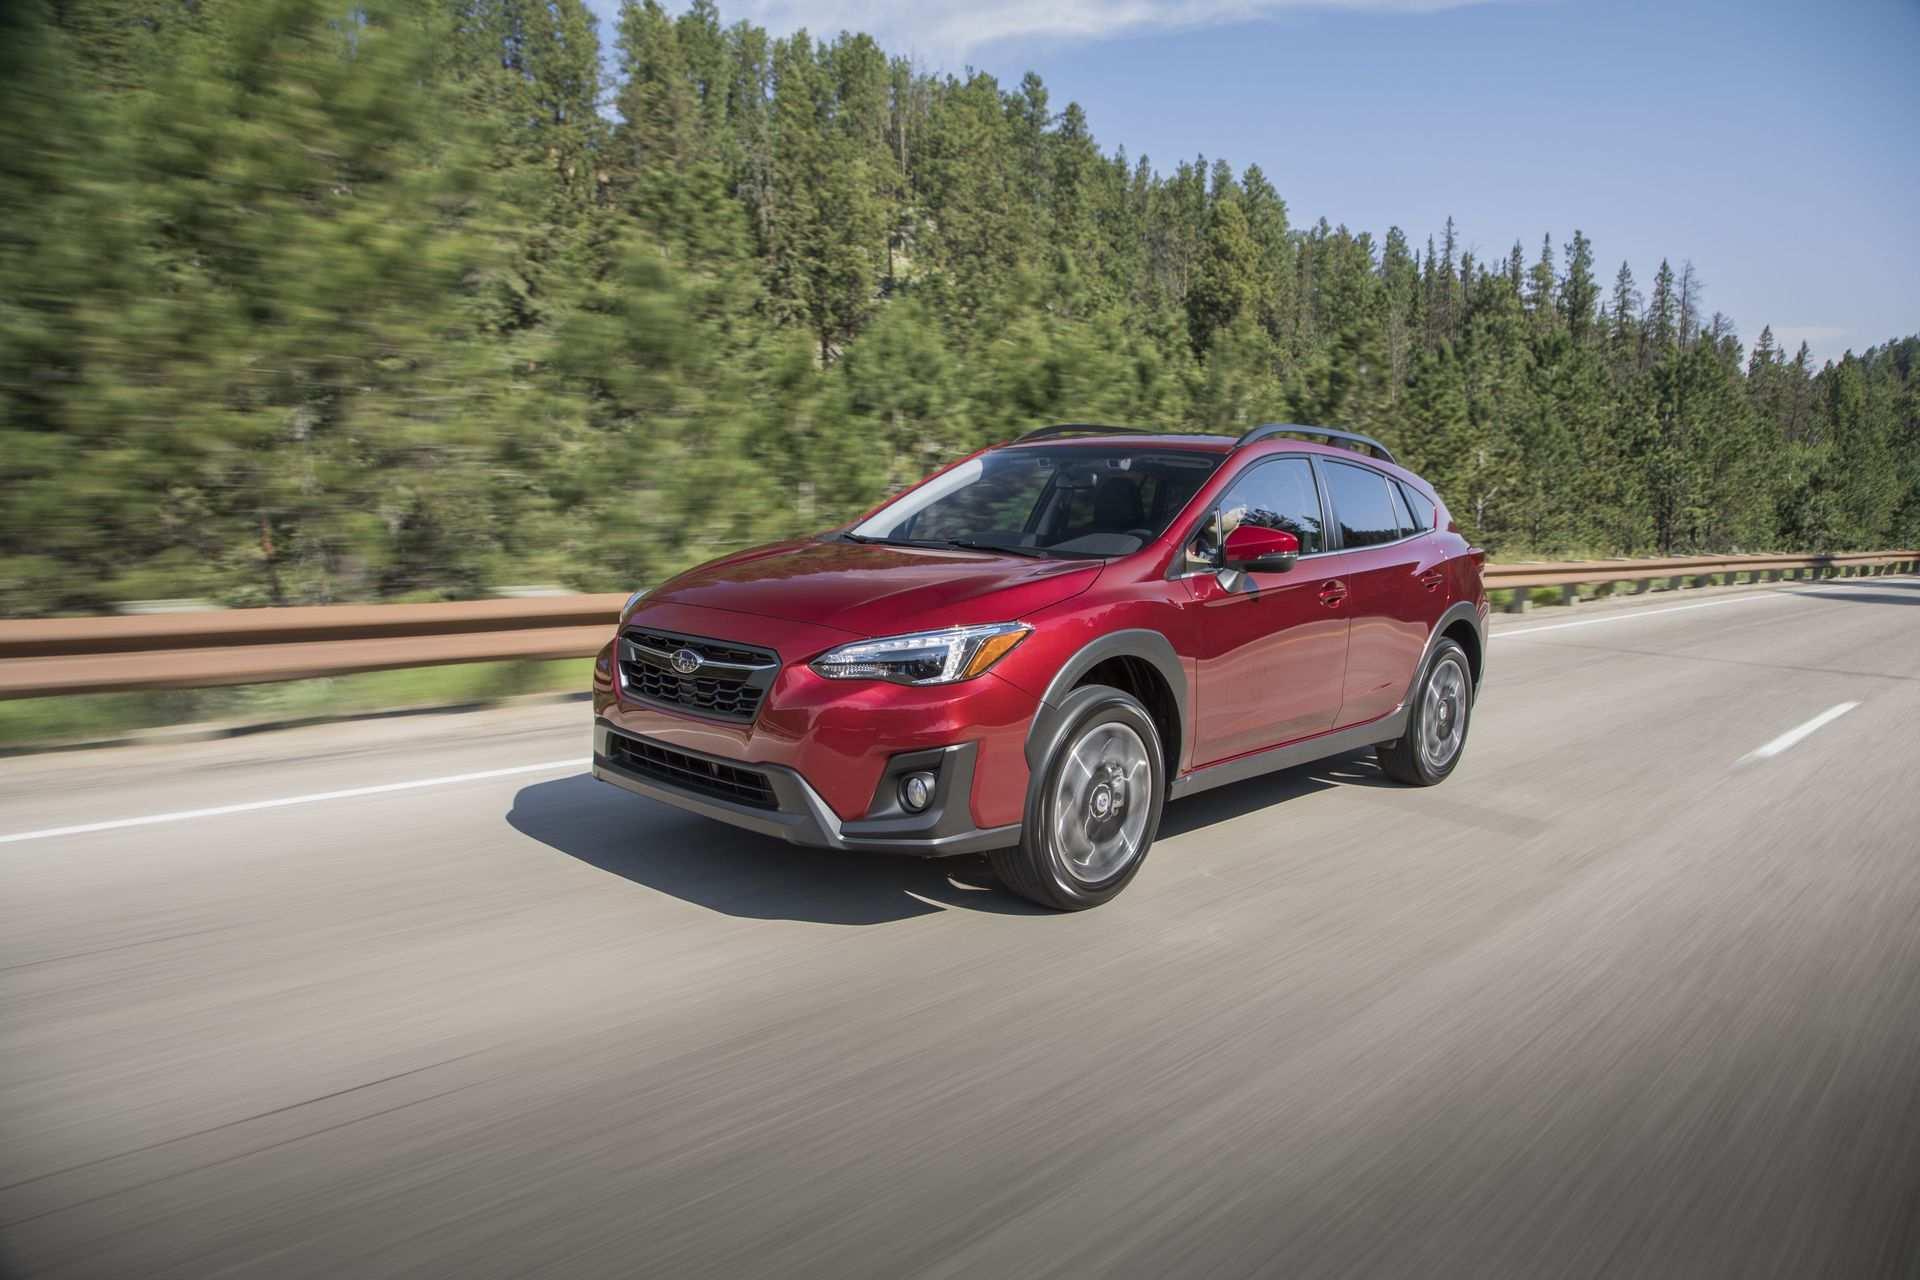 29 Great 2019 Subaru Hybrid Speed Test with 2019 Subaru Hybrid